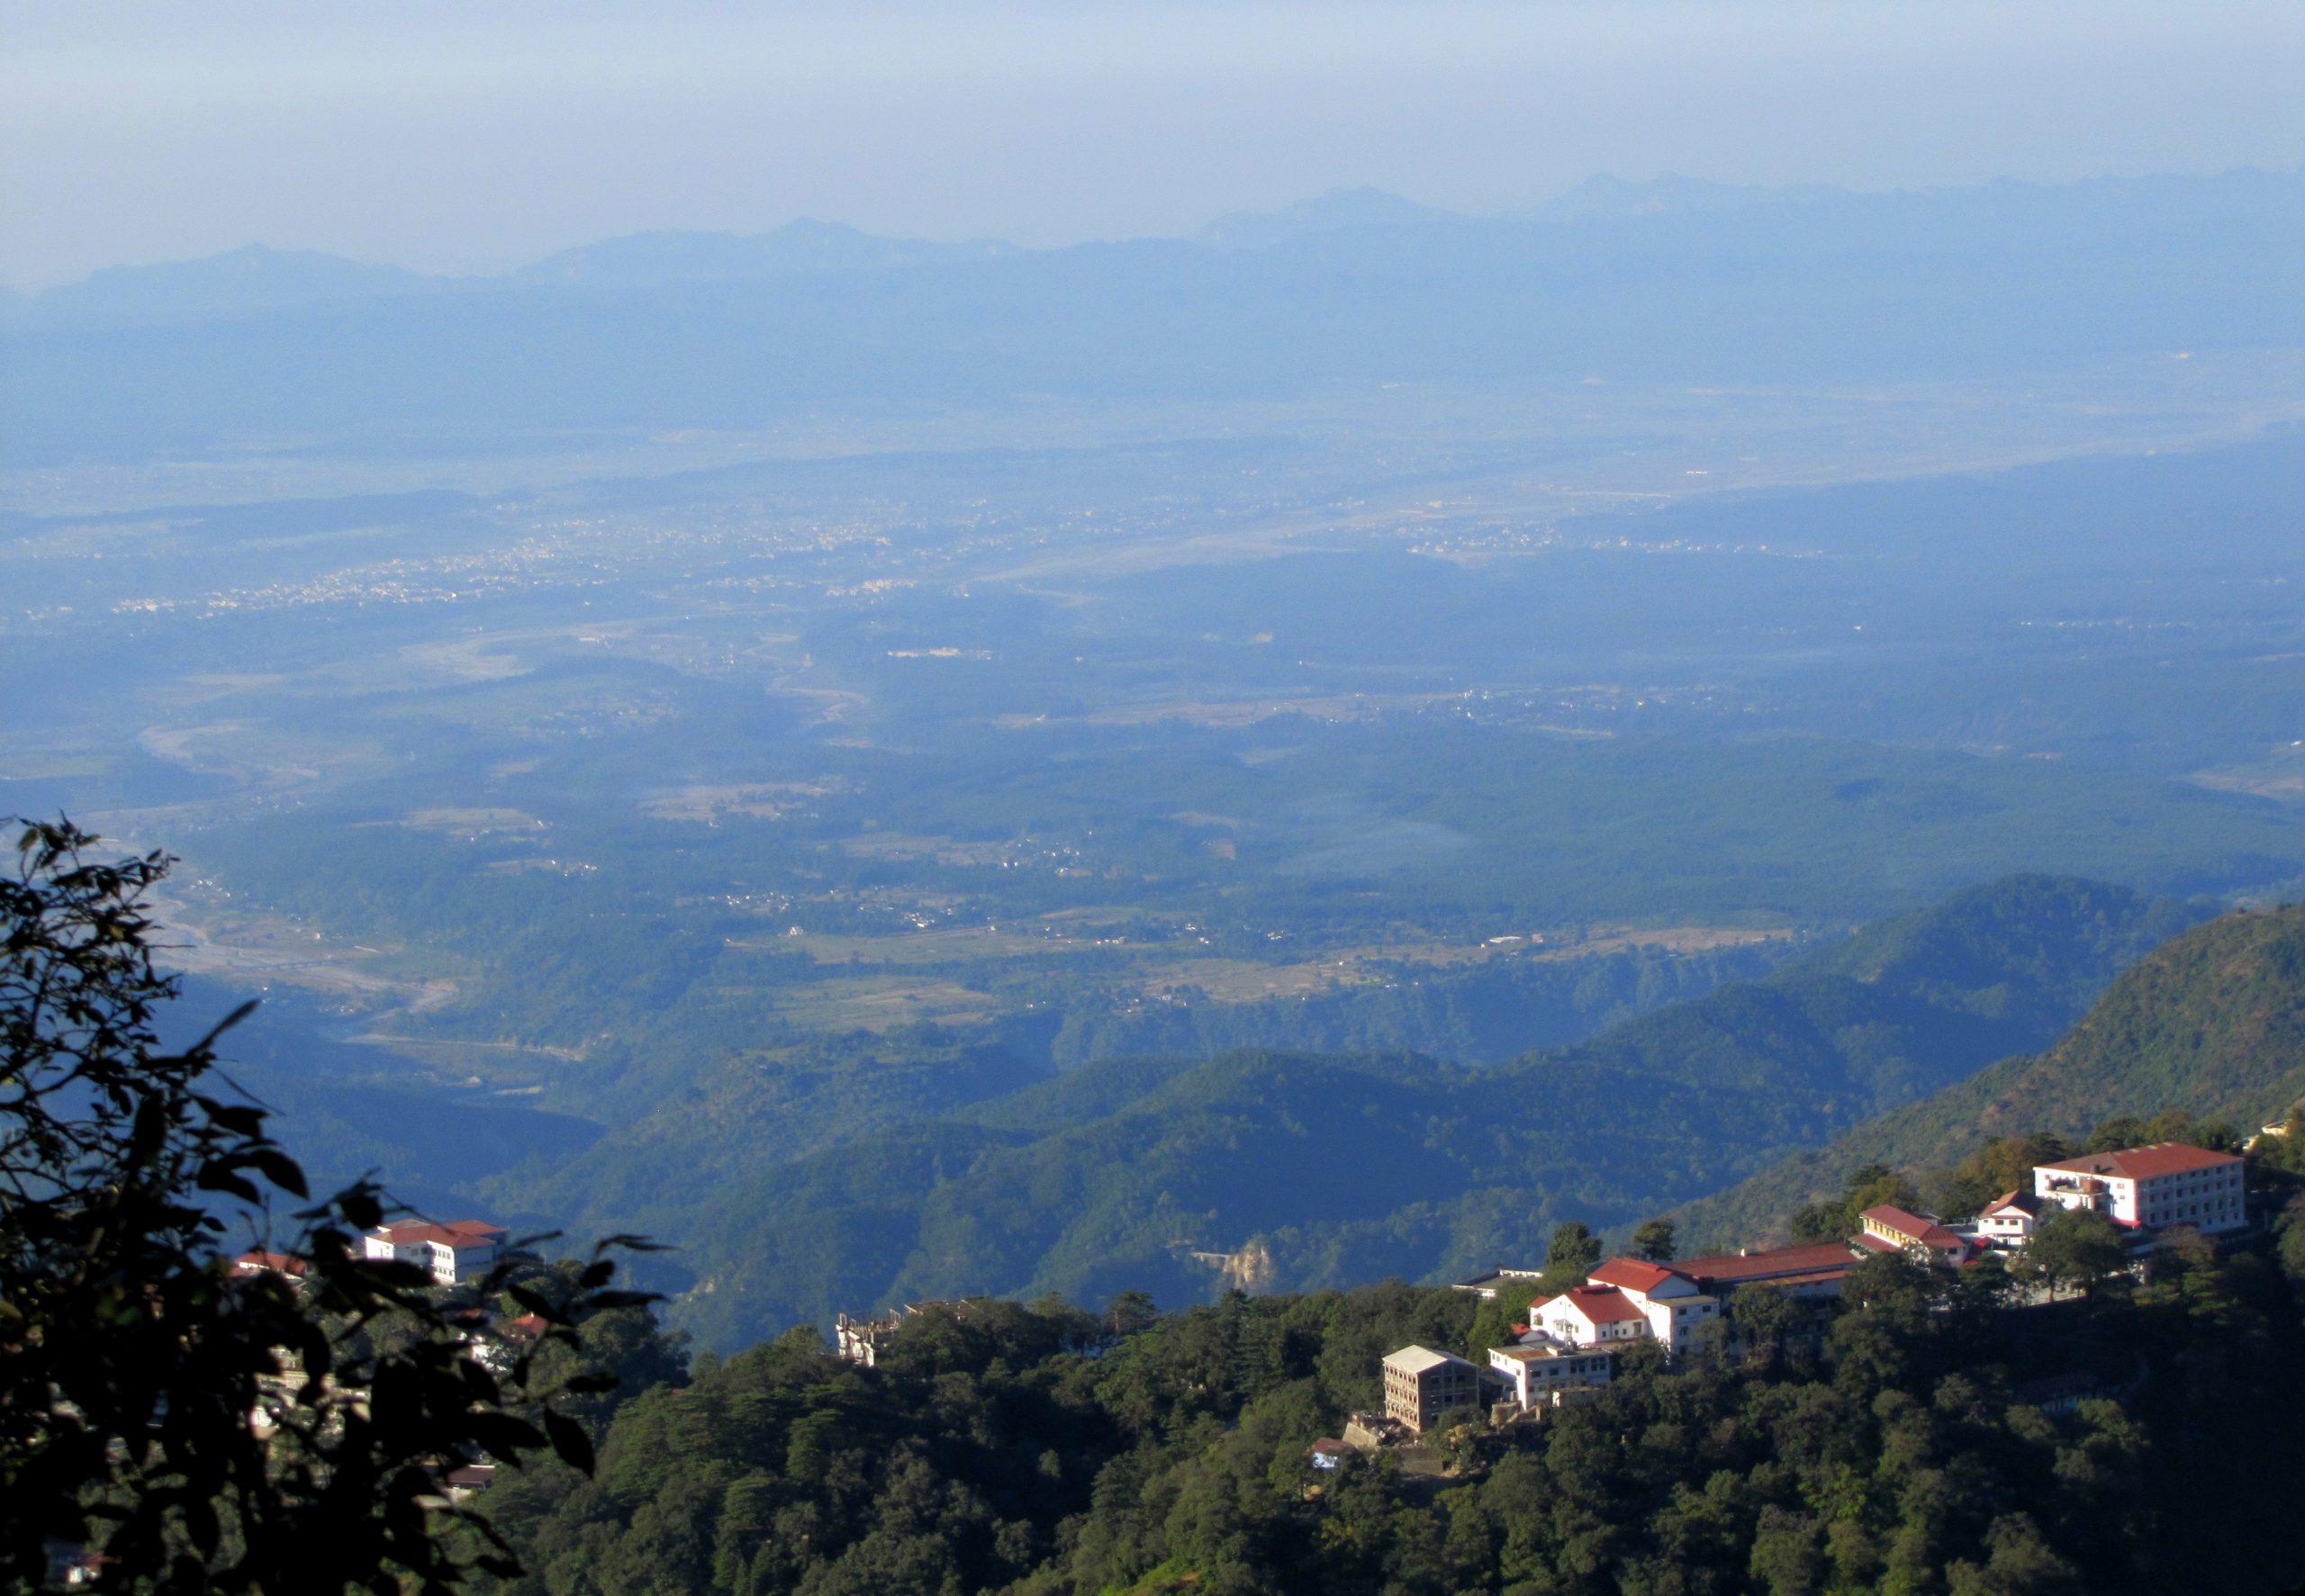 Landour Most Popular Place To Visit In Uttarakhand